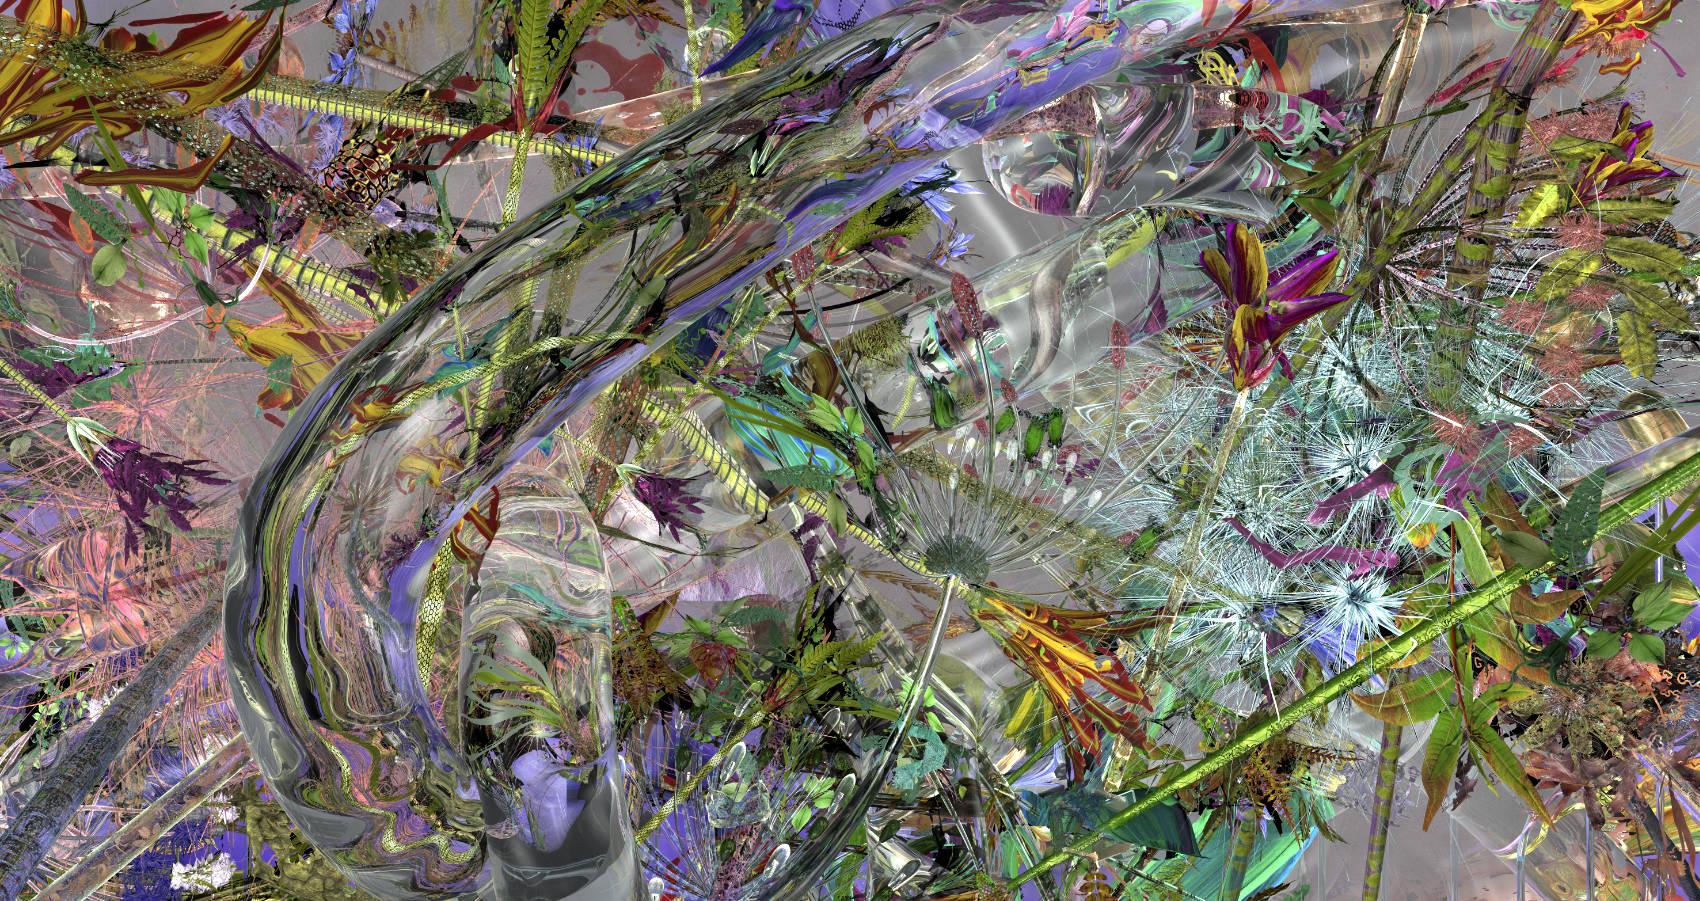 Xenobiosis 16, 2012, C-Print, 106 x 200 cm